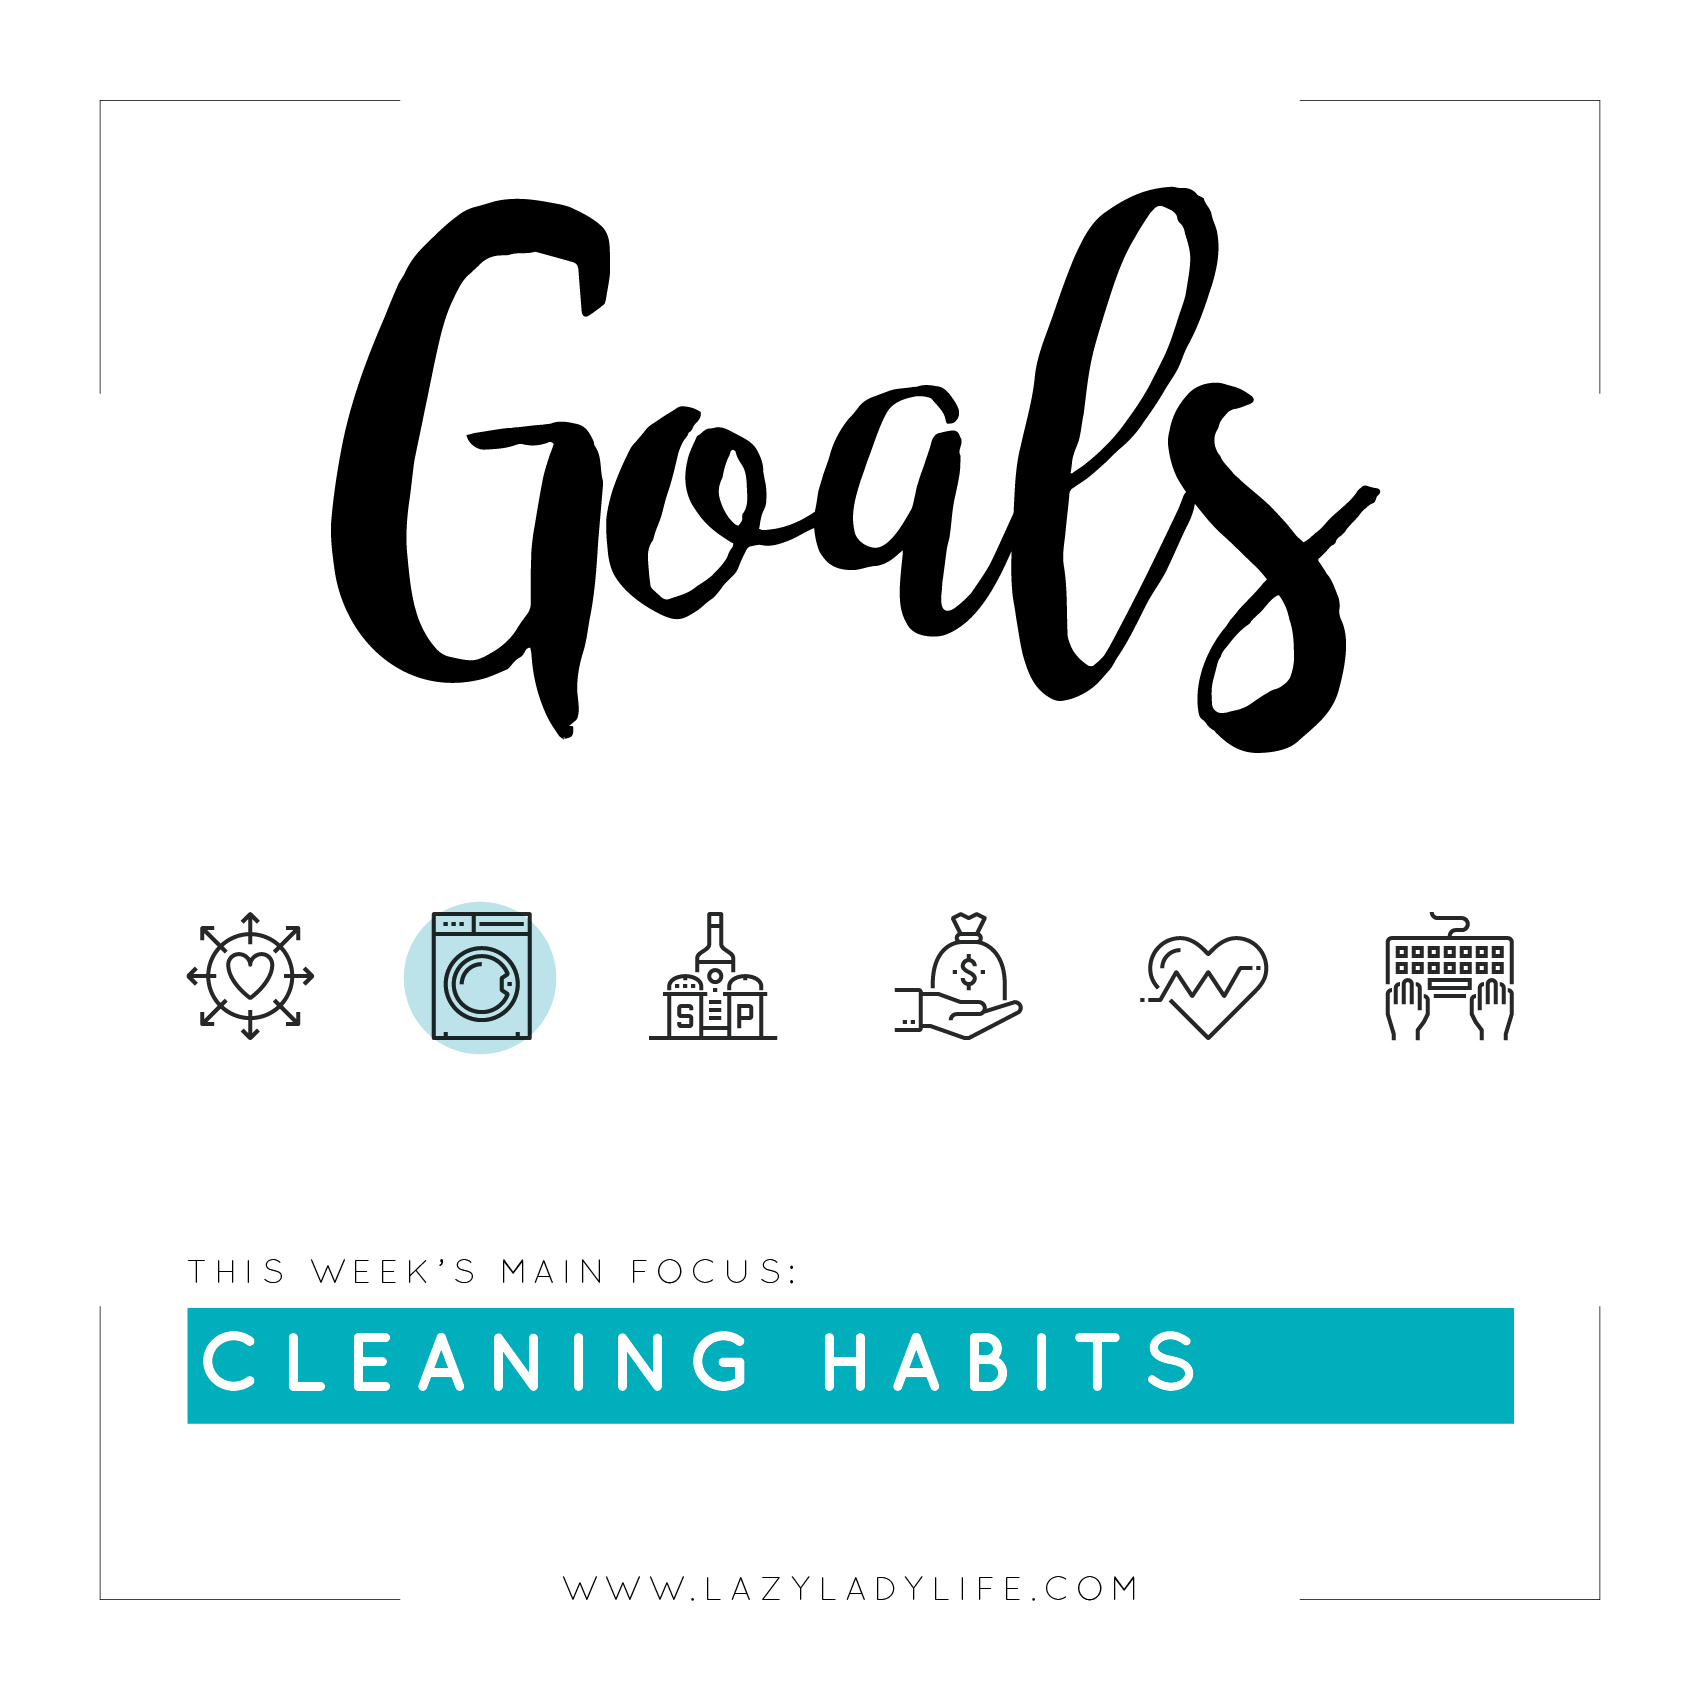 Goals-Cleaning-Habits-LazyLadyLife.jpg